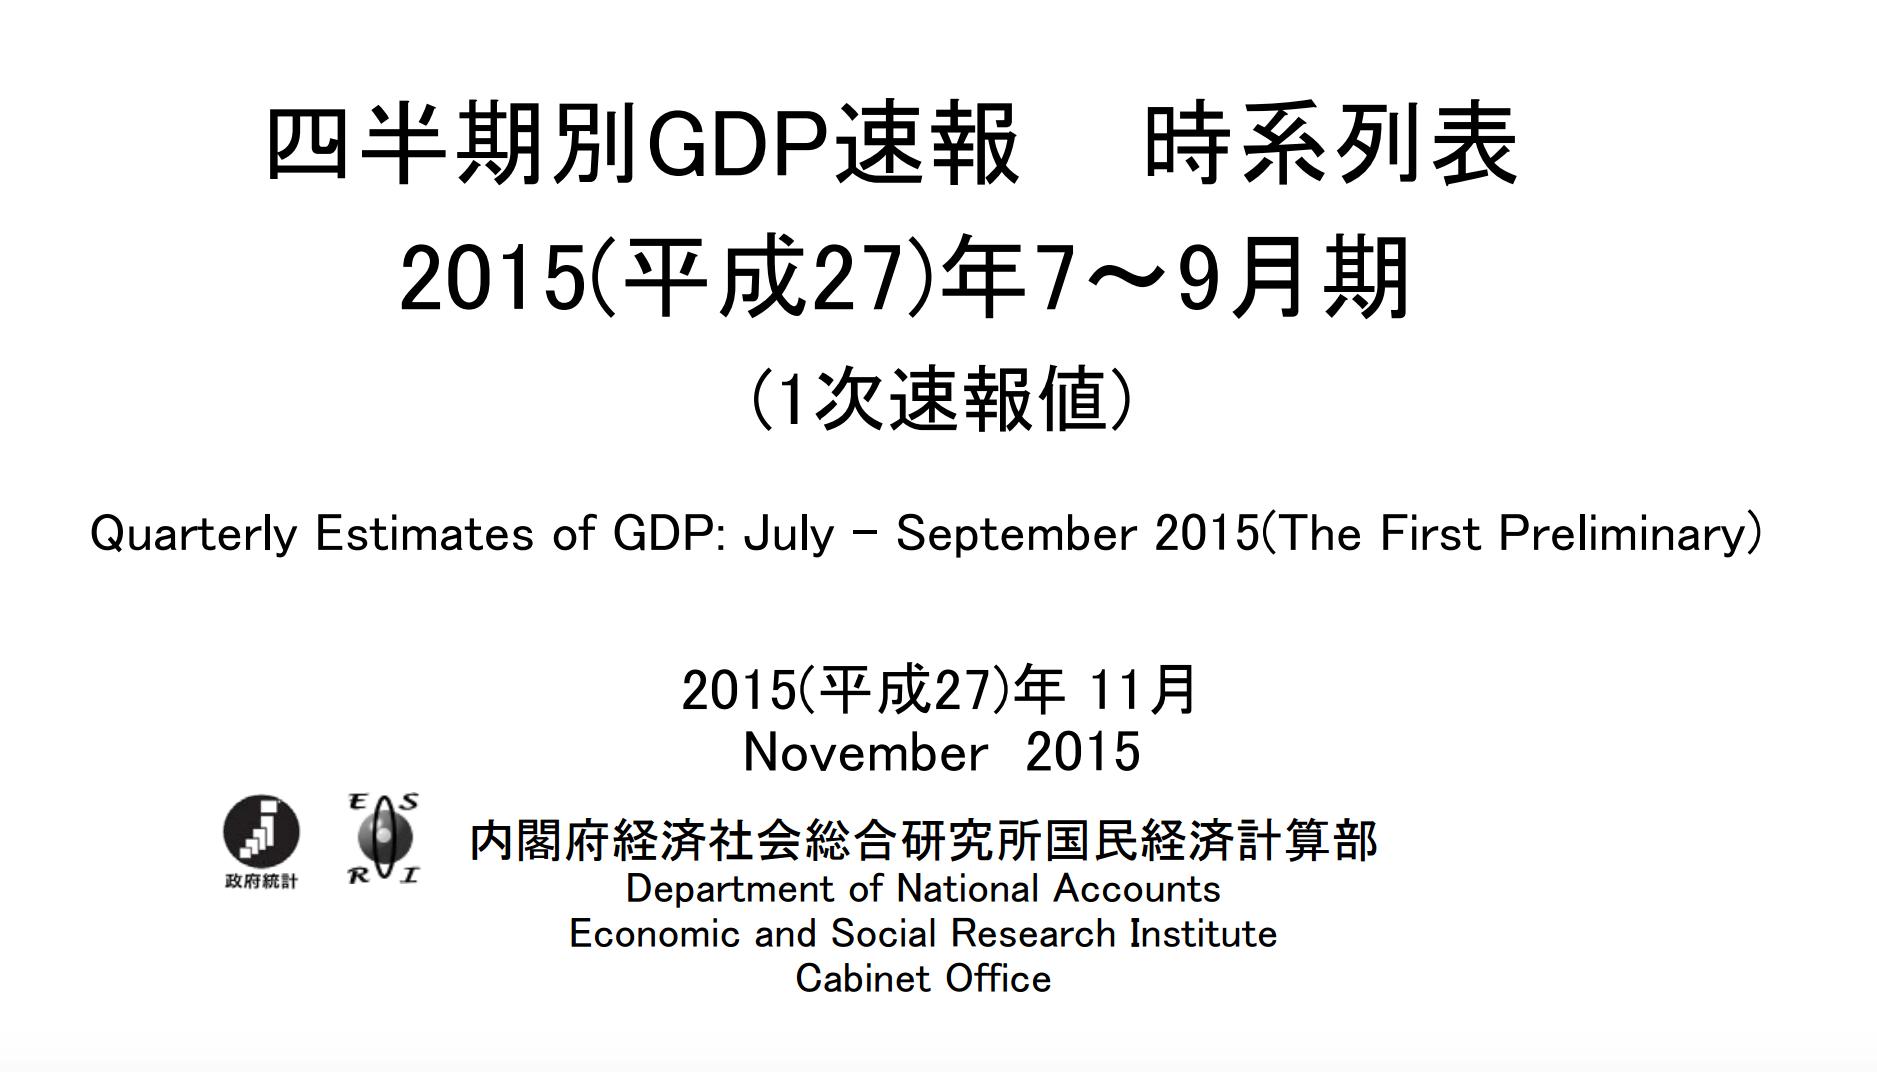 GDP Japan